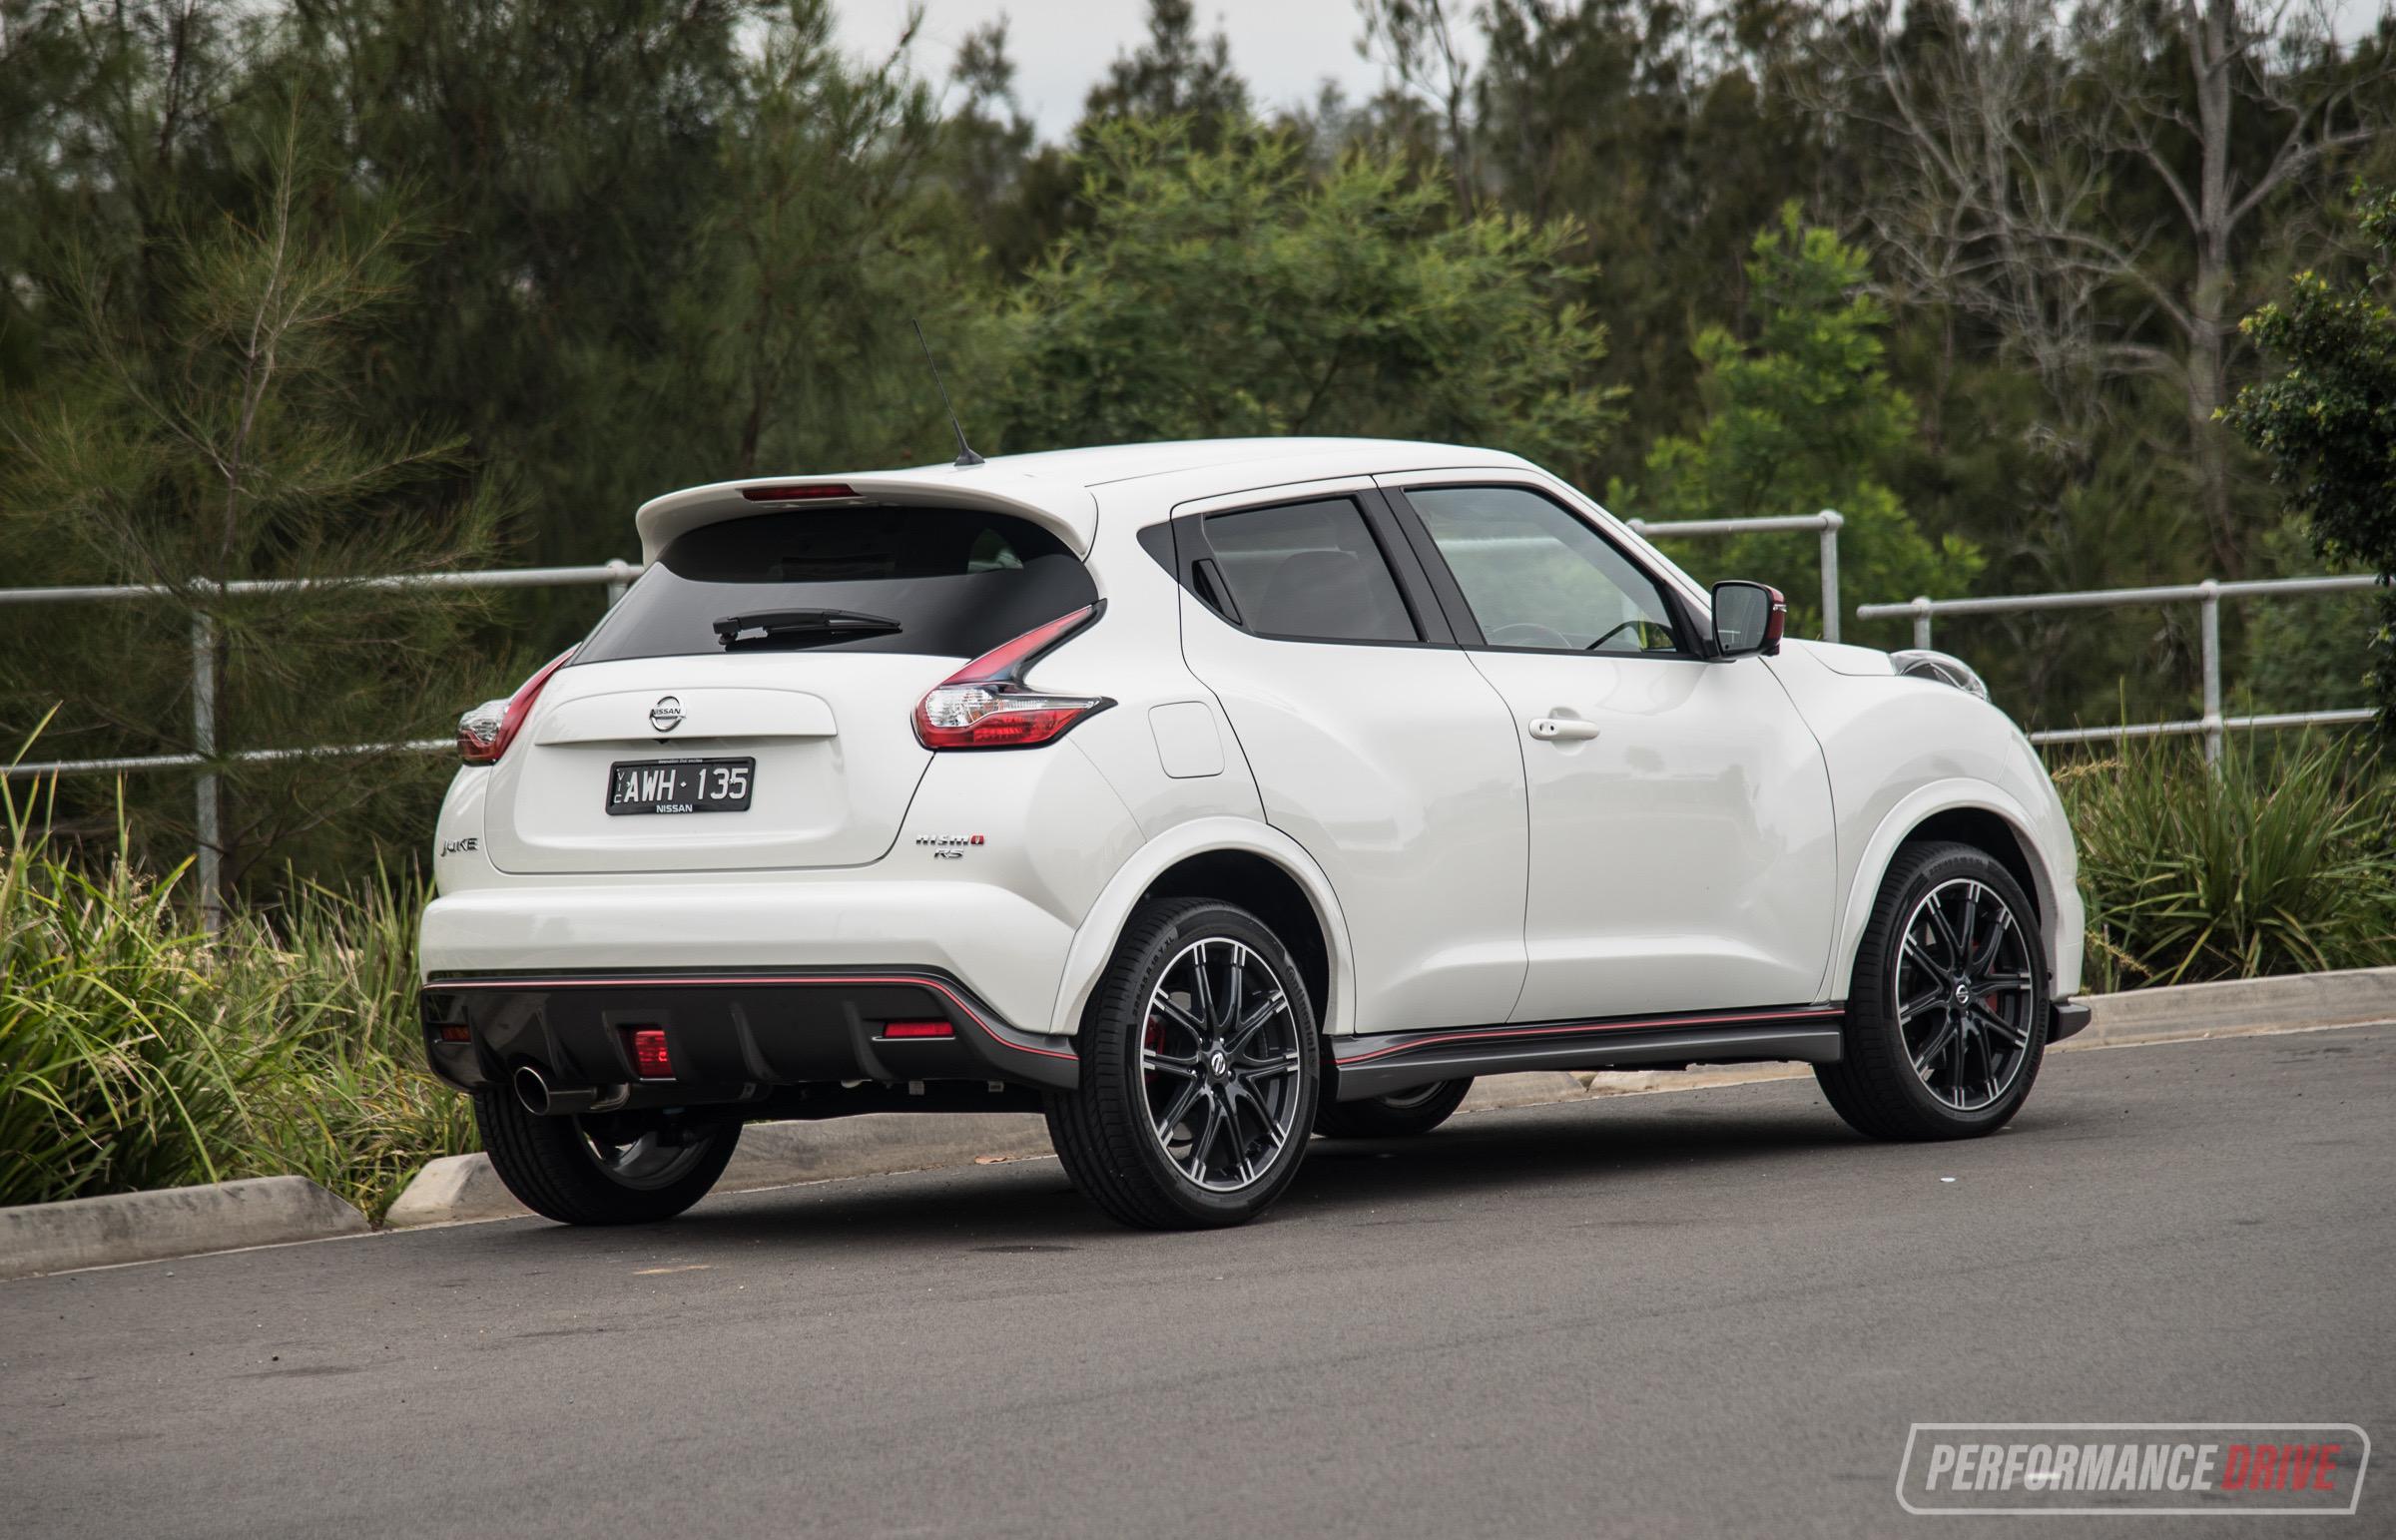 2018 Nissan Juke Nismo RS review (video) | PerformanceDrive